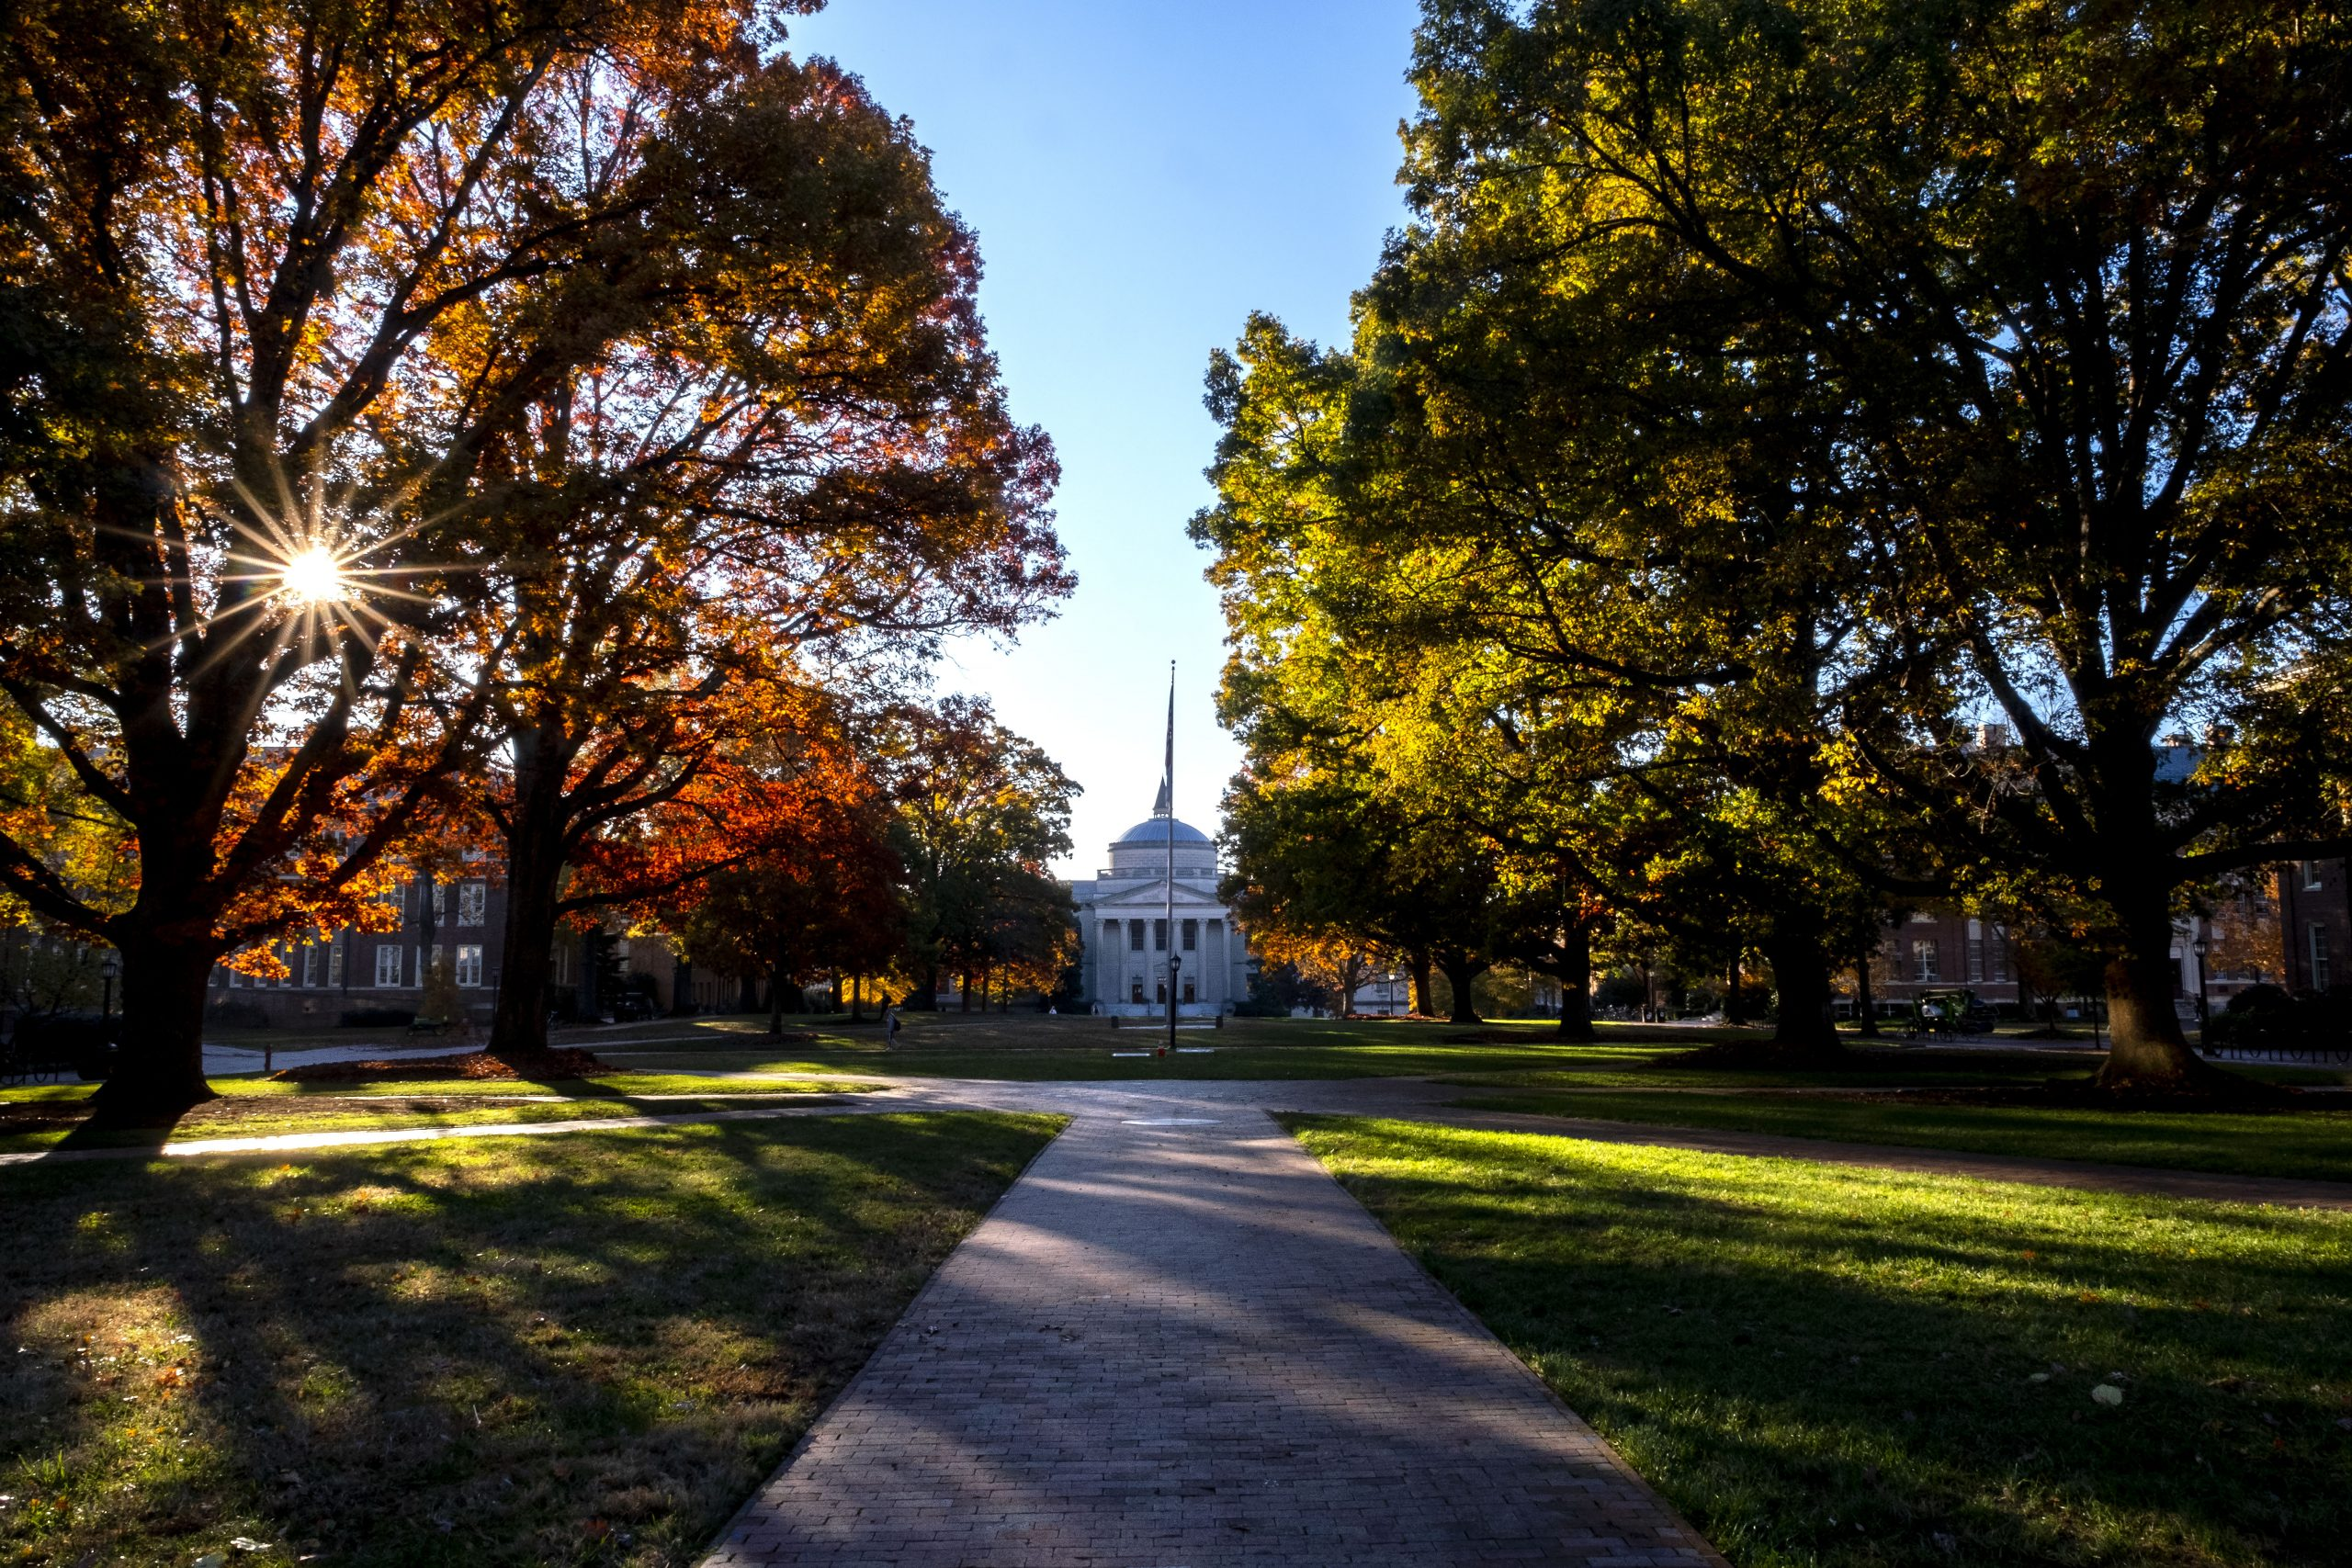 Fall scene of campus